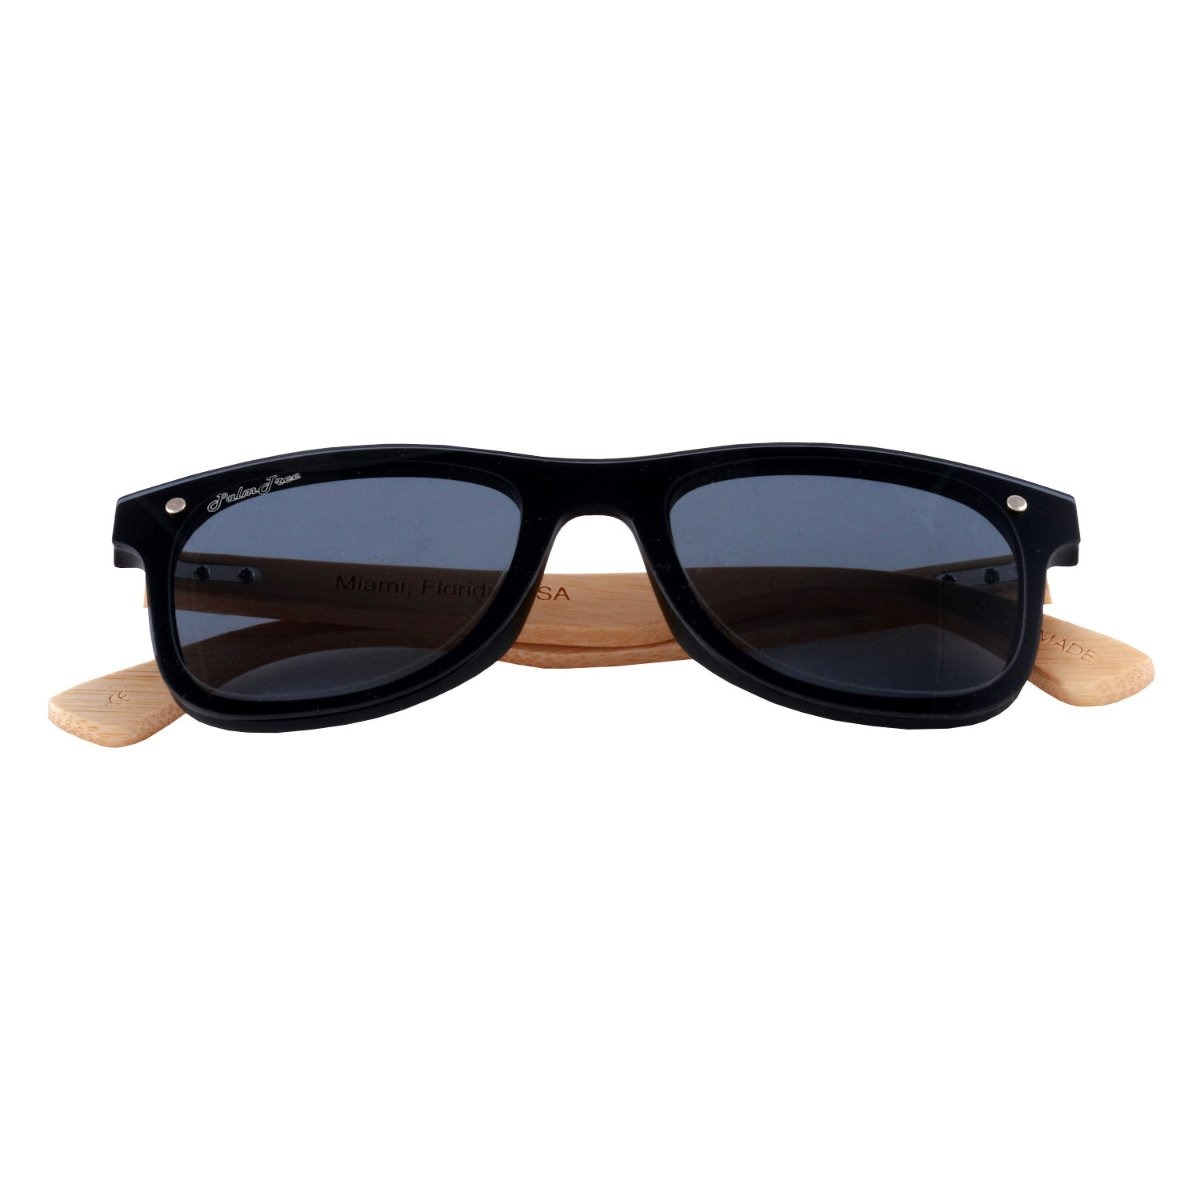 c07d5f0326 lentes de sol bambu madera liberty palmtree negro ecologico. Cargando zoom.